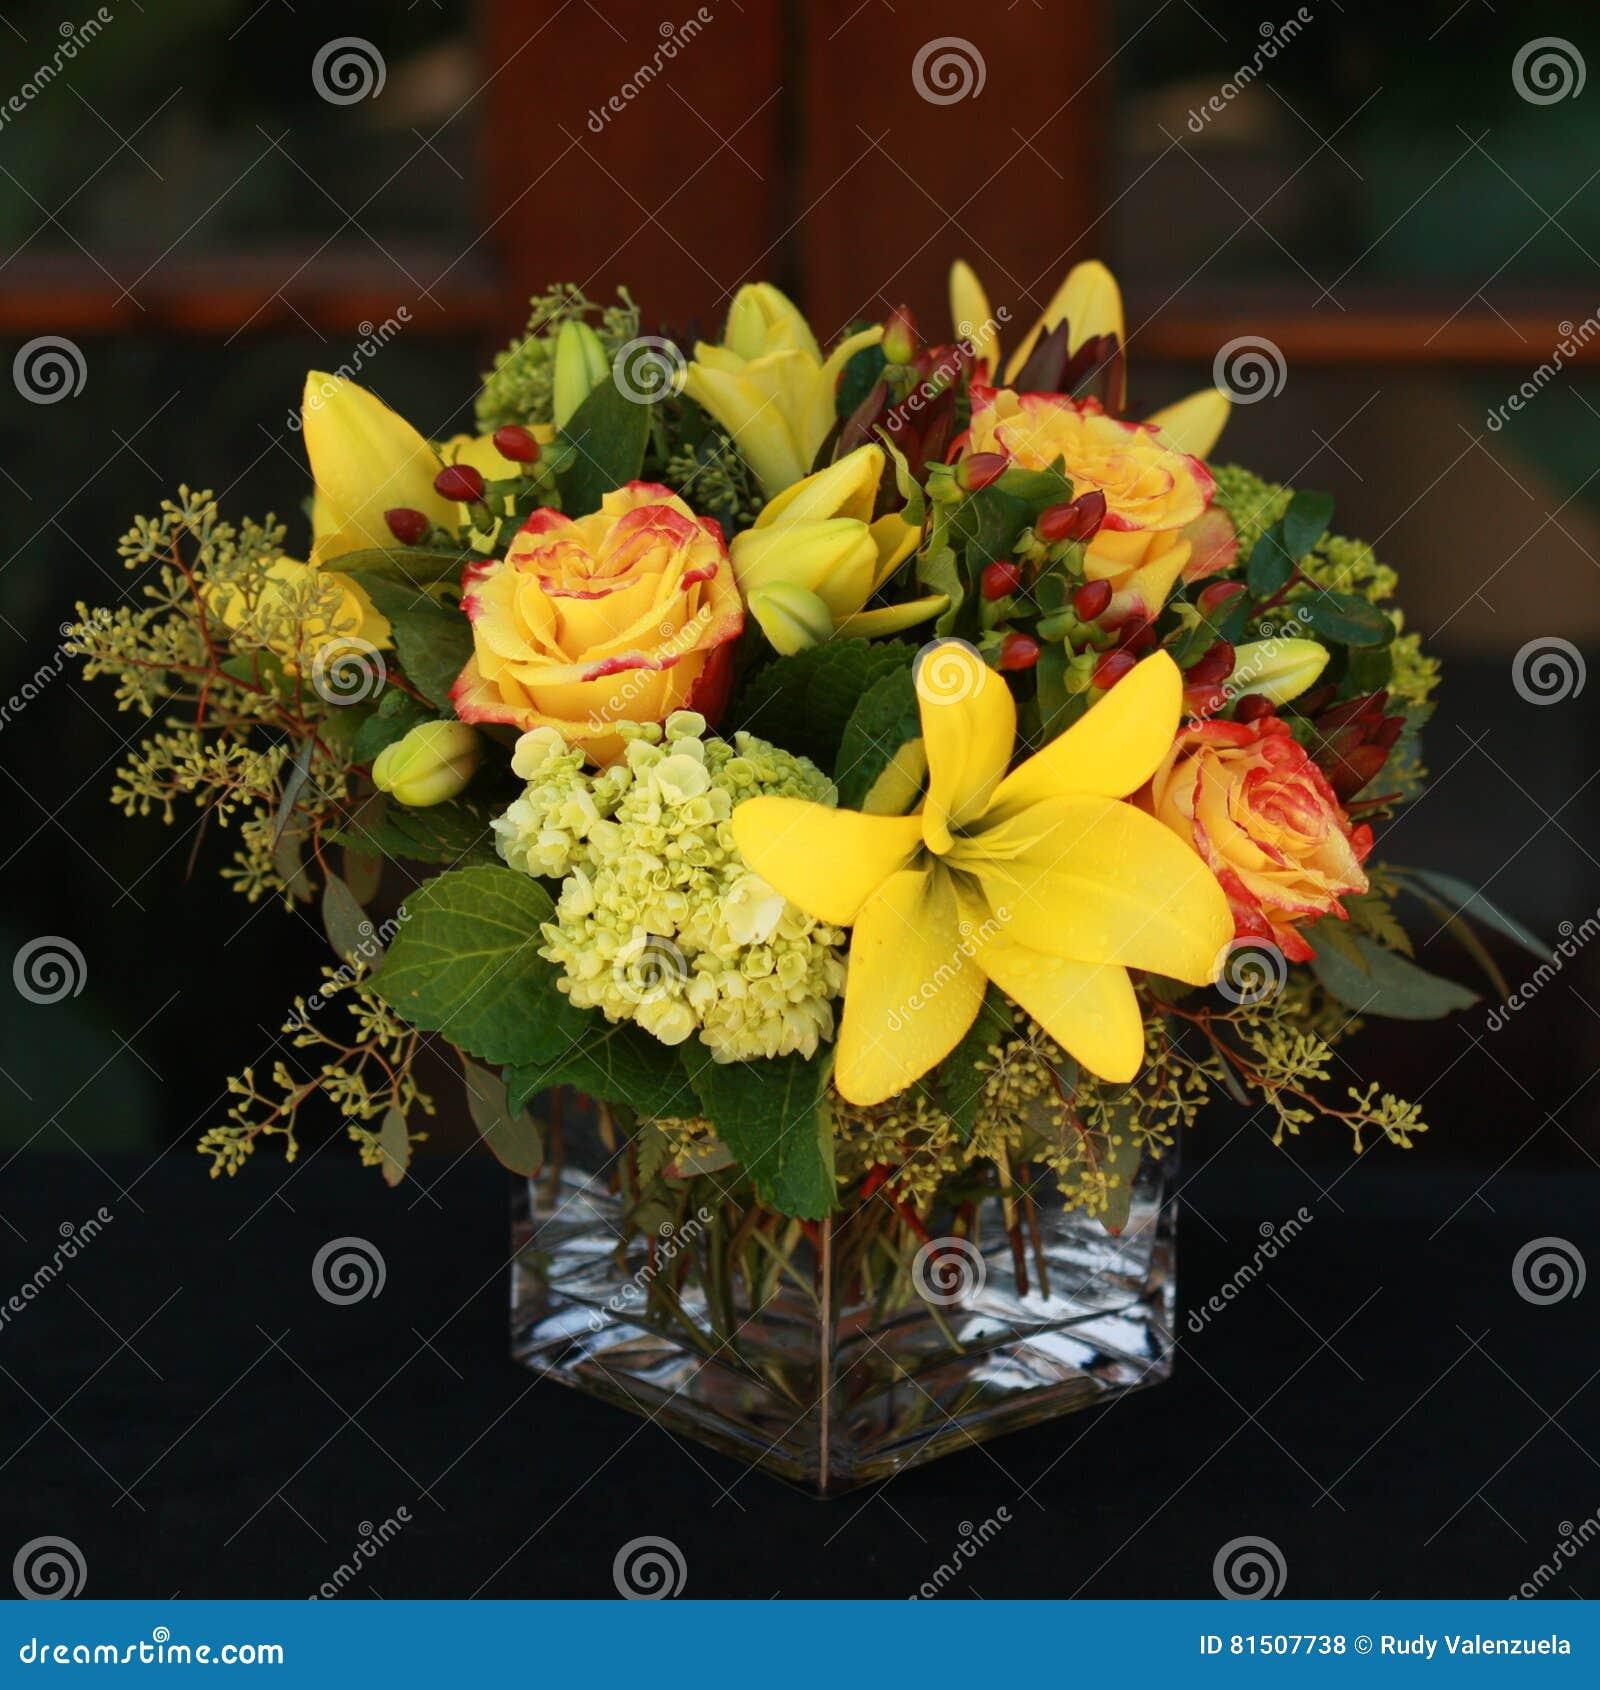 Yellow Flower Arrangement Stock Photo Image Of Square 81507738